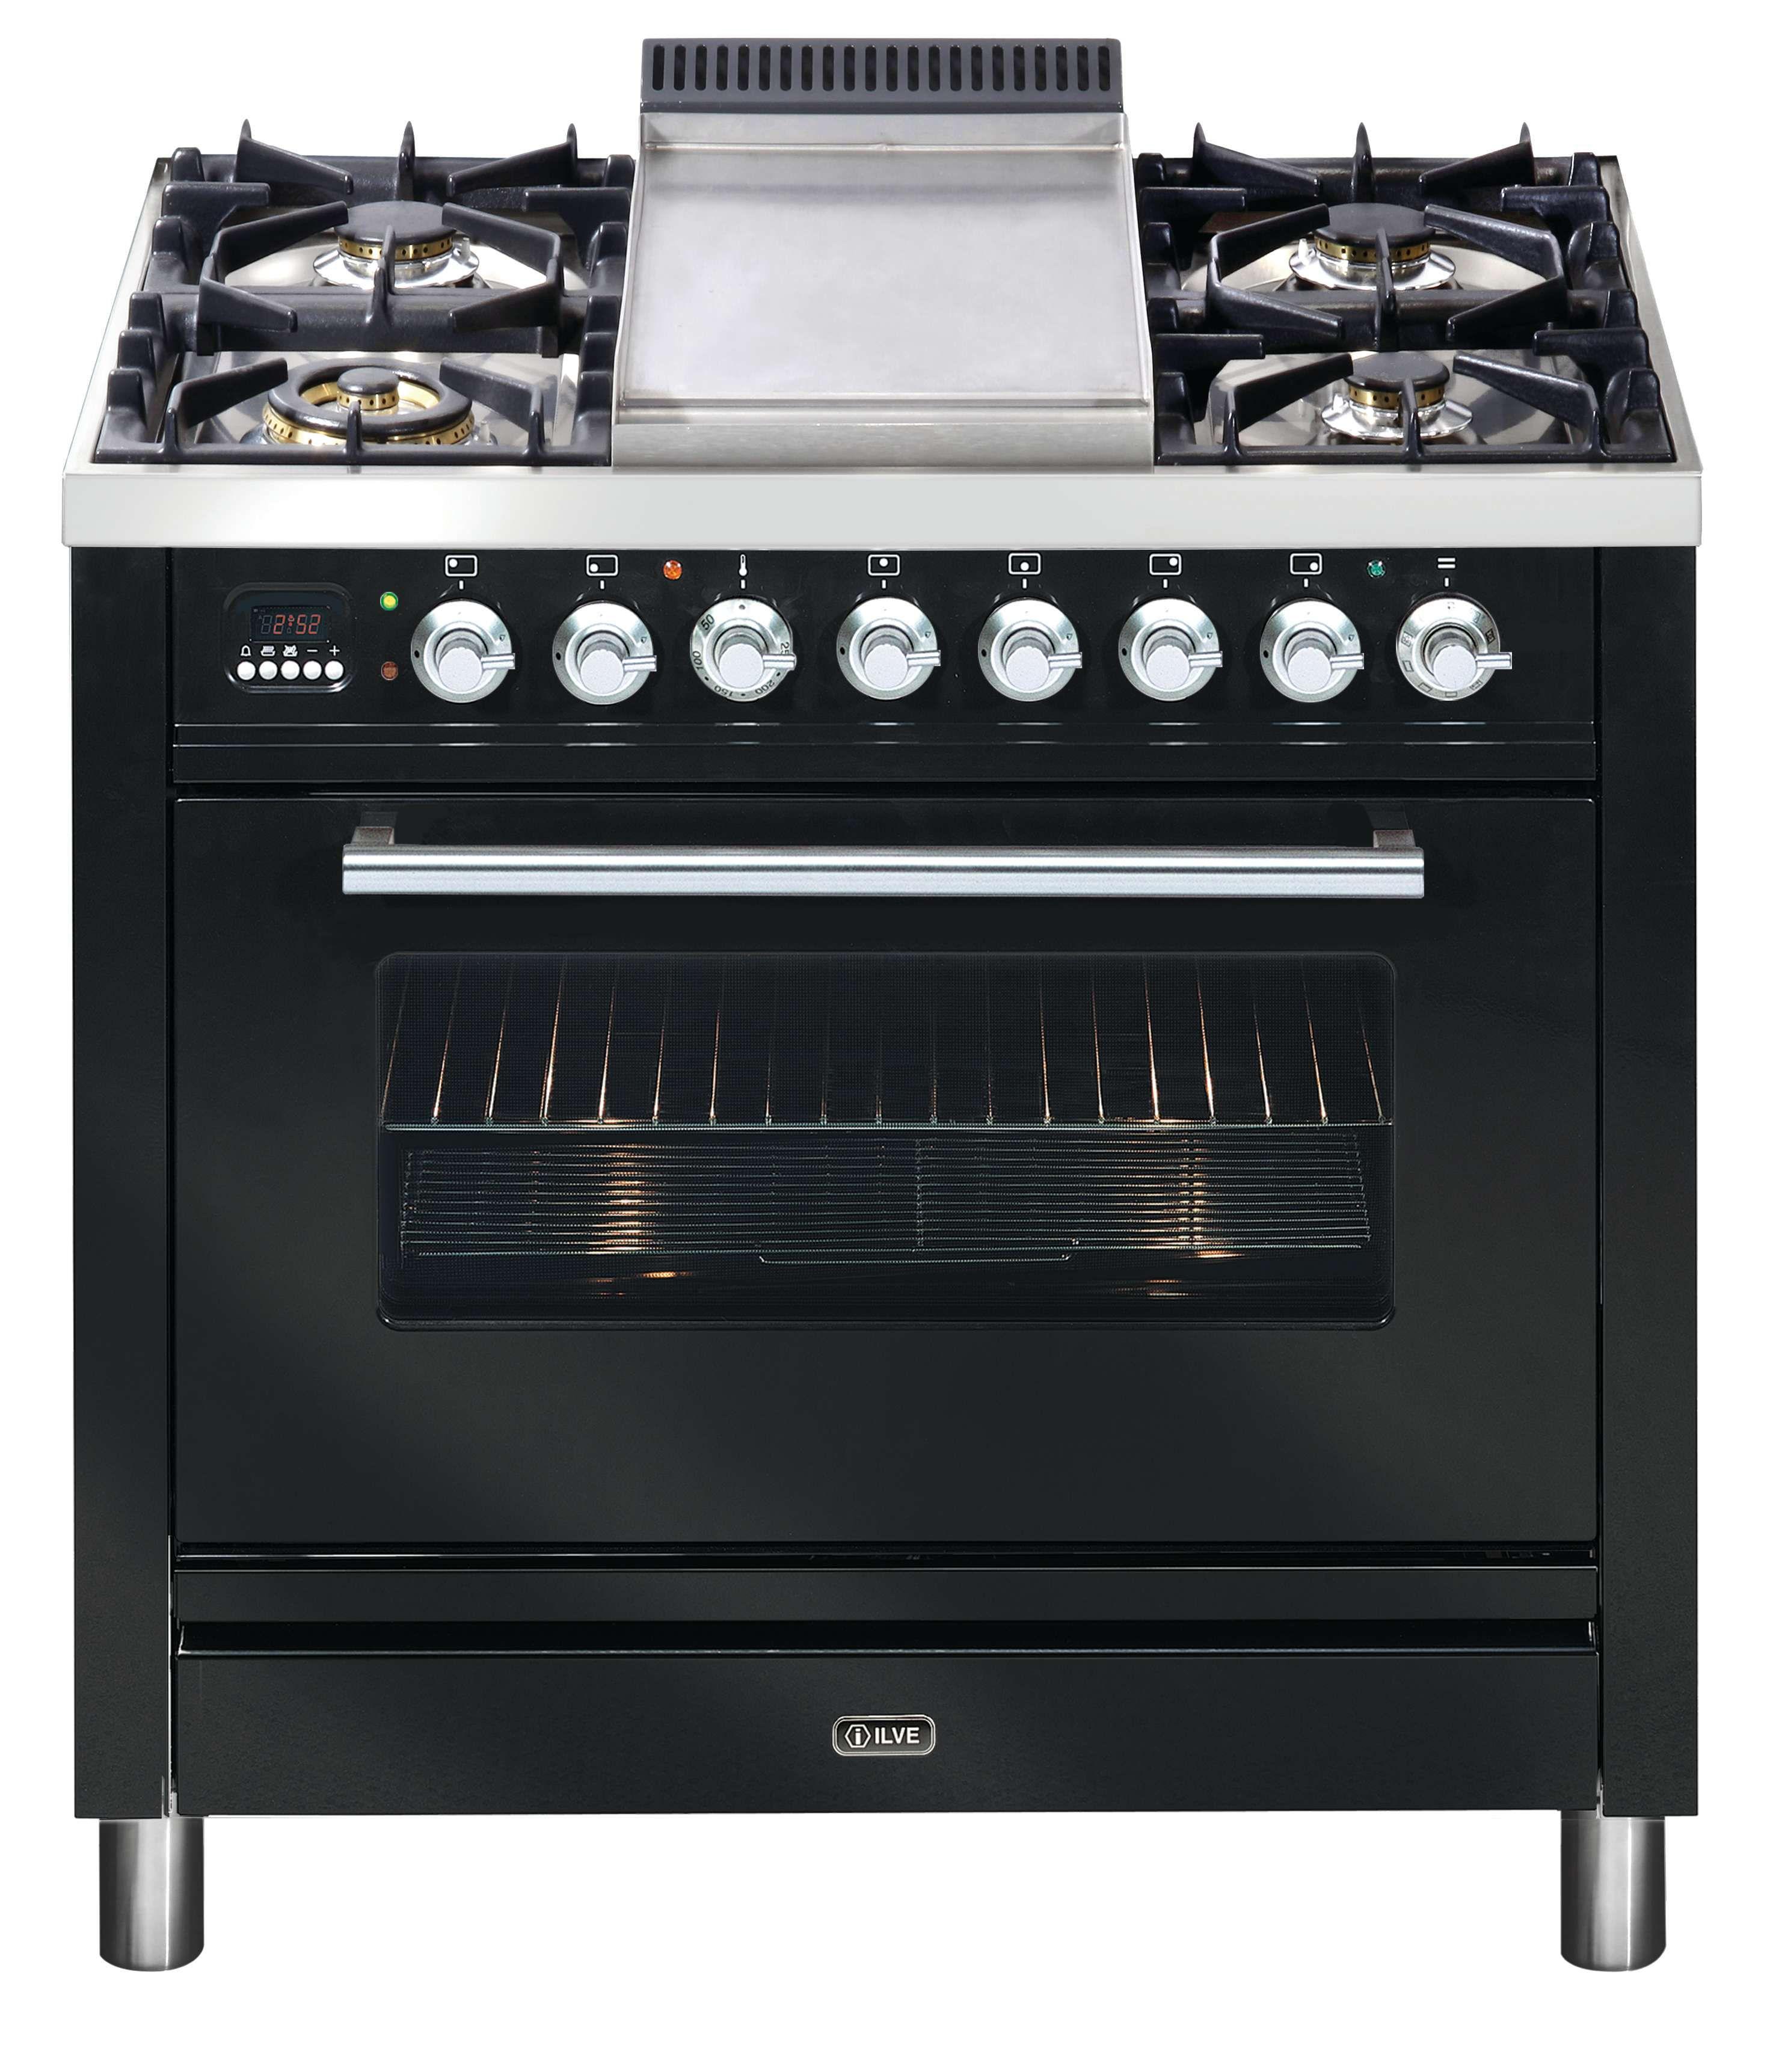 ILVE 90cm Quadra Oven in Gloss Black with Teppanyaki Hot Plate ...